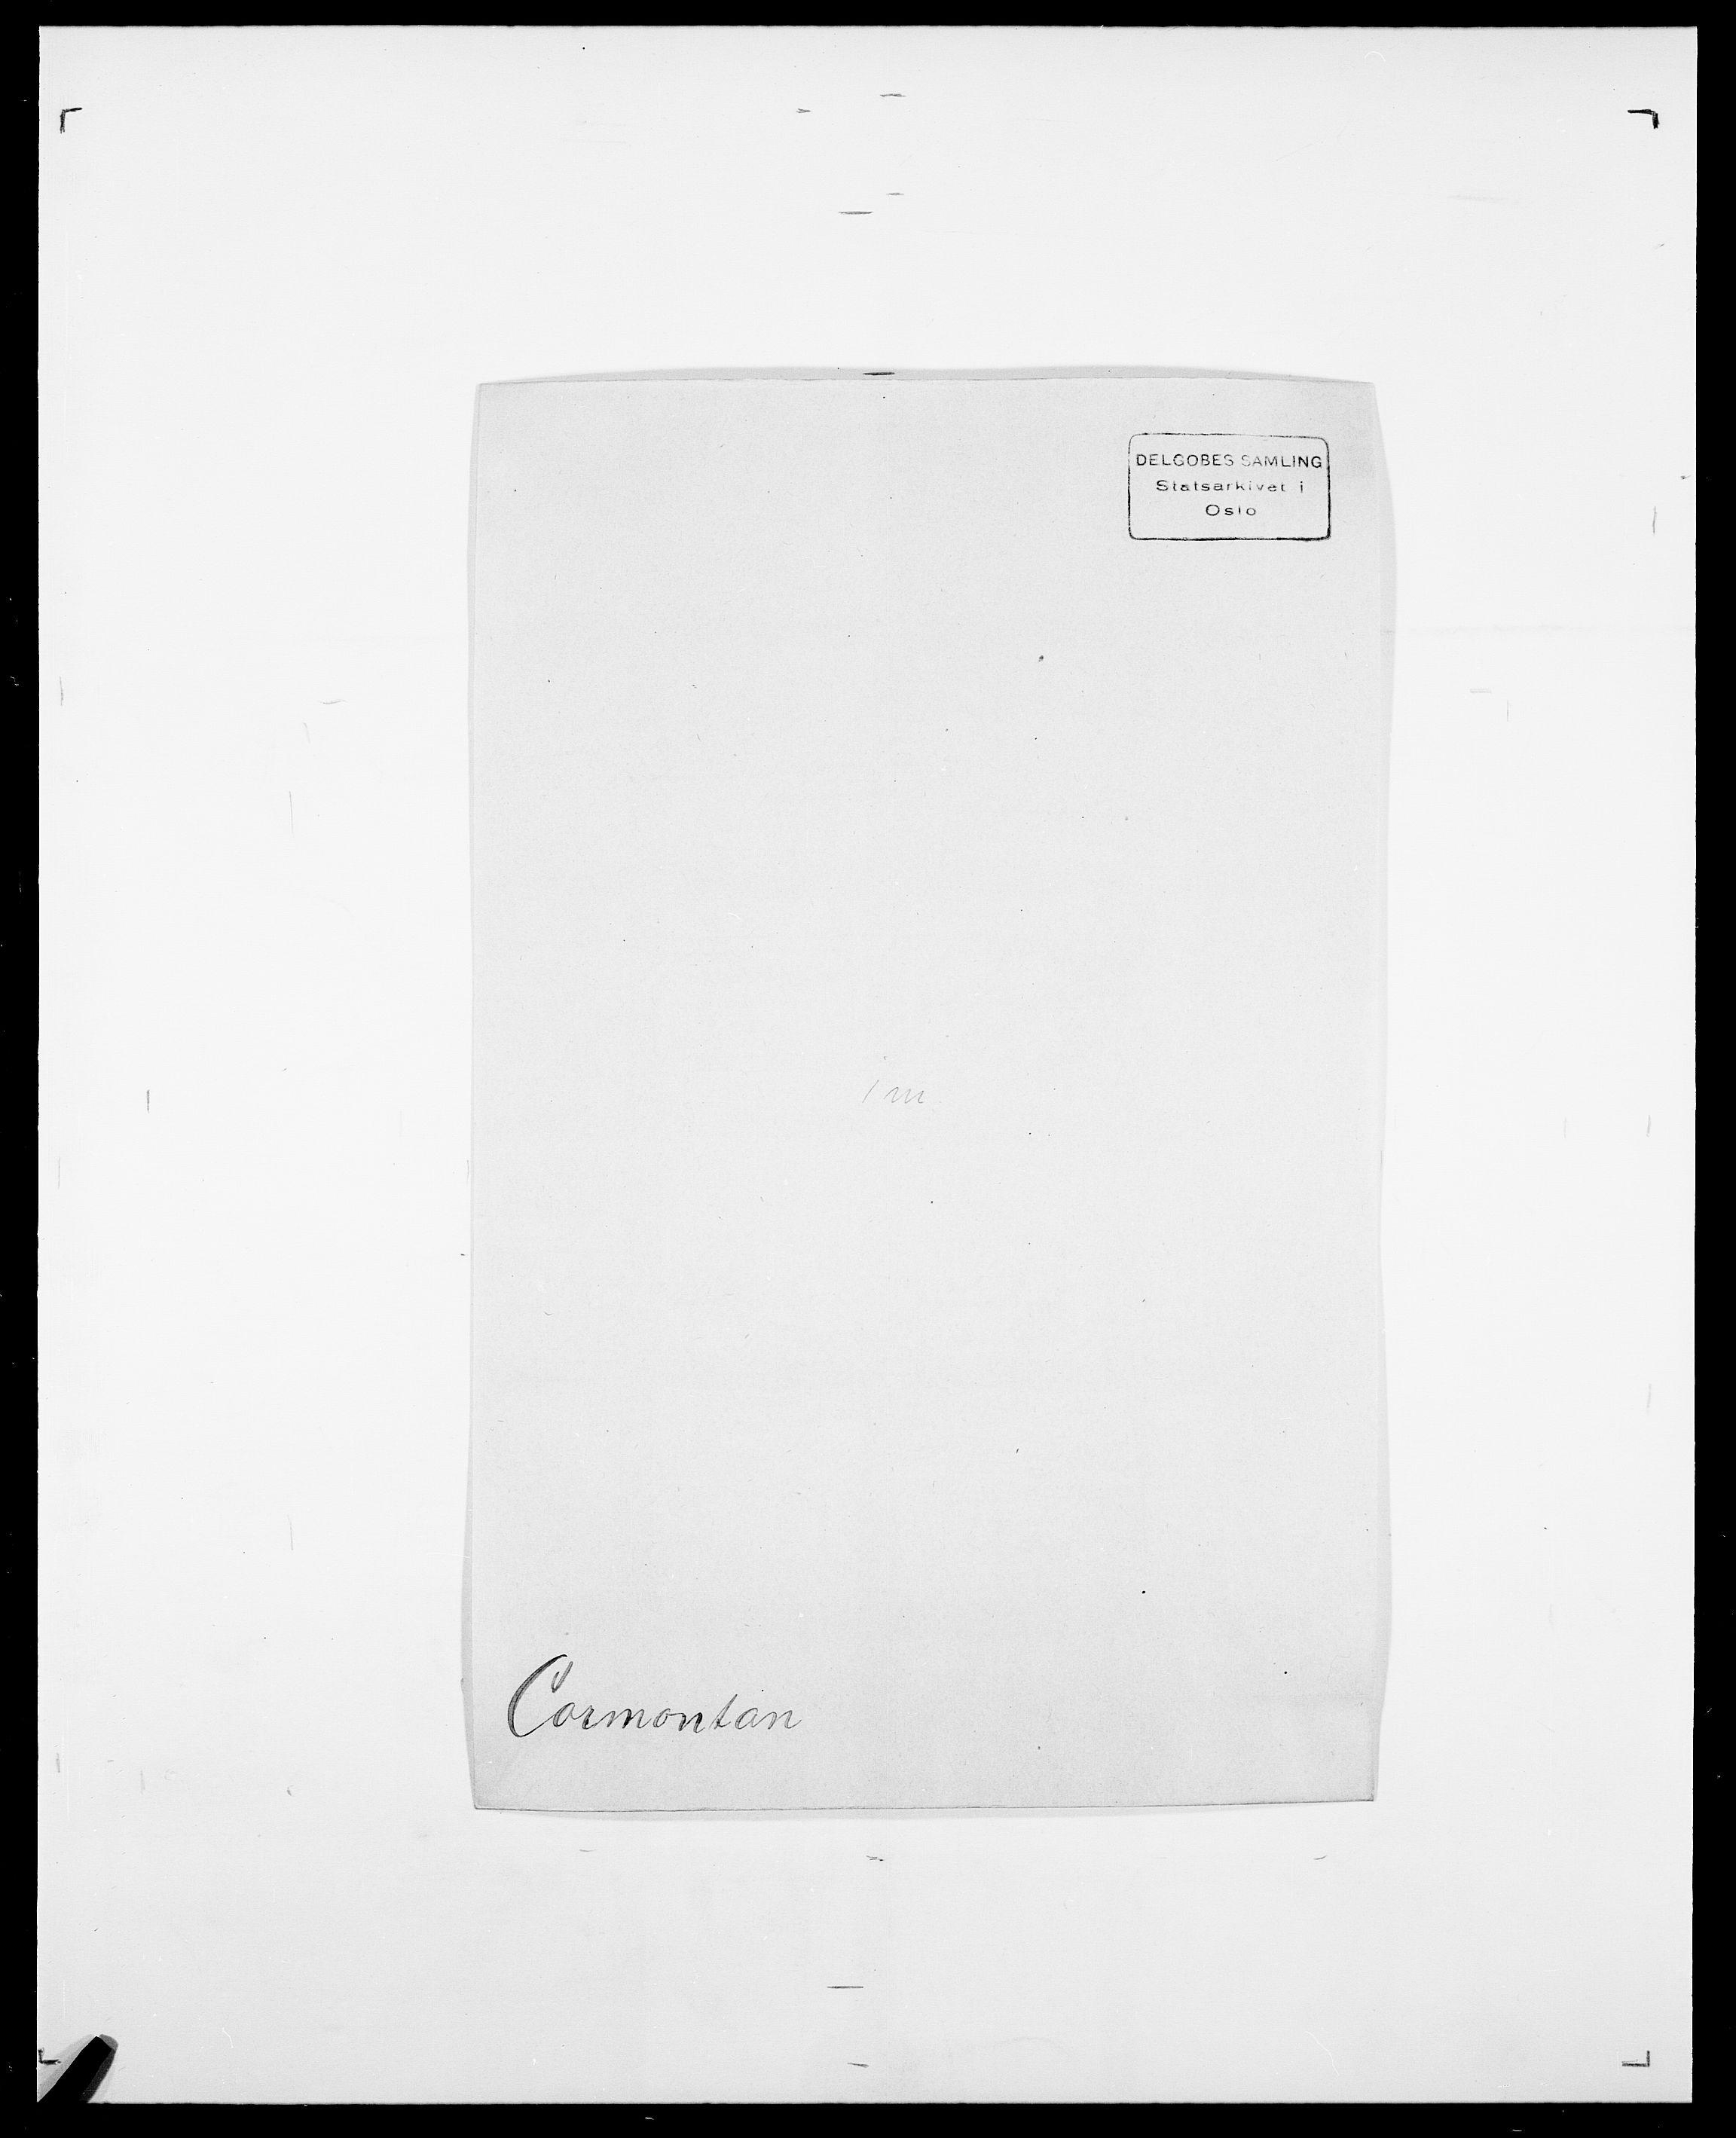 SAO, Delgobe, Charles Antoine - samling, D/Da/L0008: Capjon - Dagenbolt, s. 533